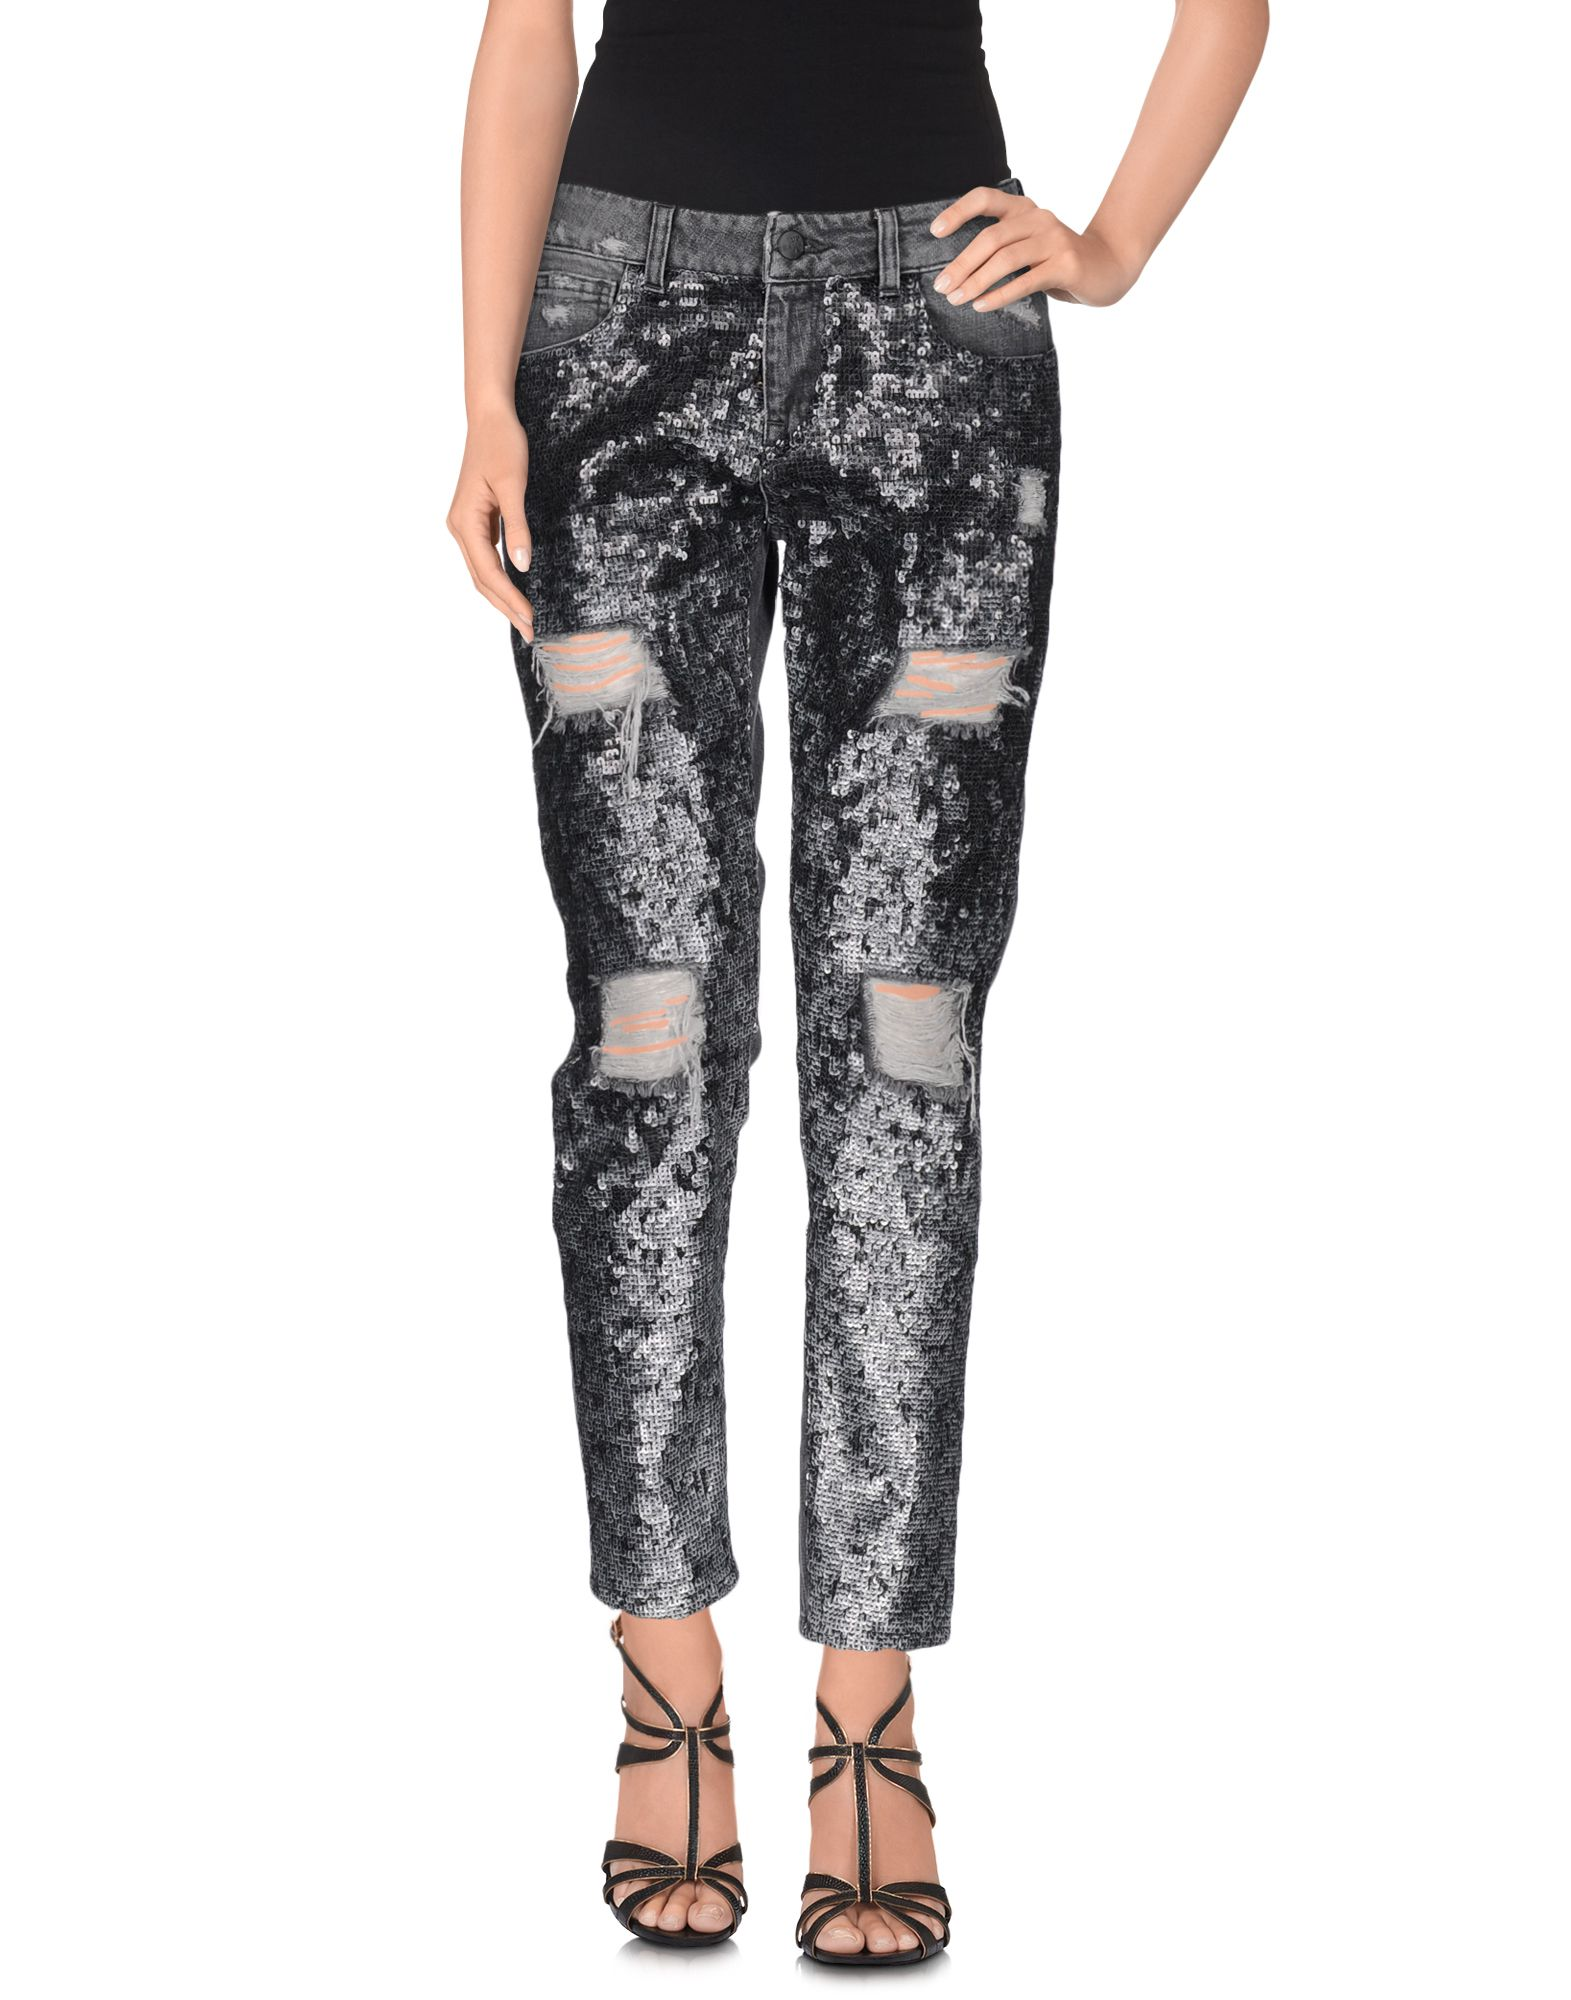 Pantaloni Jeans Up ★ Jeans Donna - Acquista online su RnypOaurVU